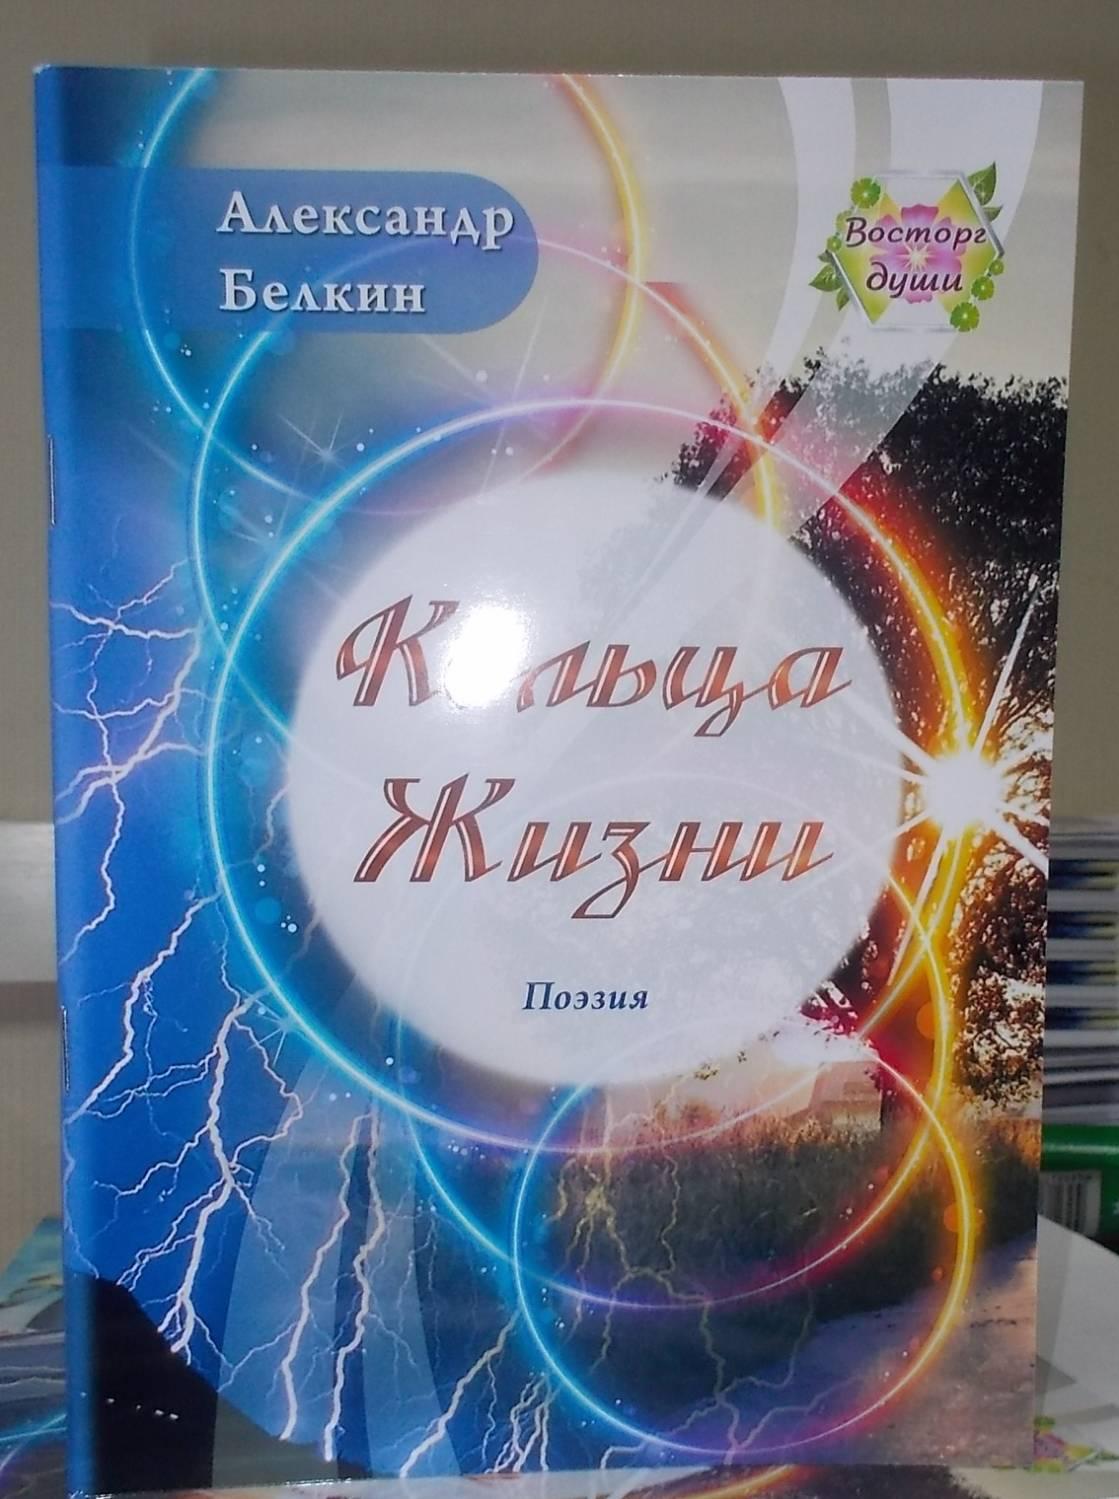 http://soyuz-pisatelei.ru/news/2015-05-26-1103